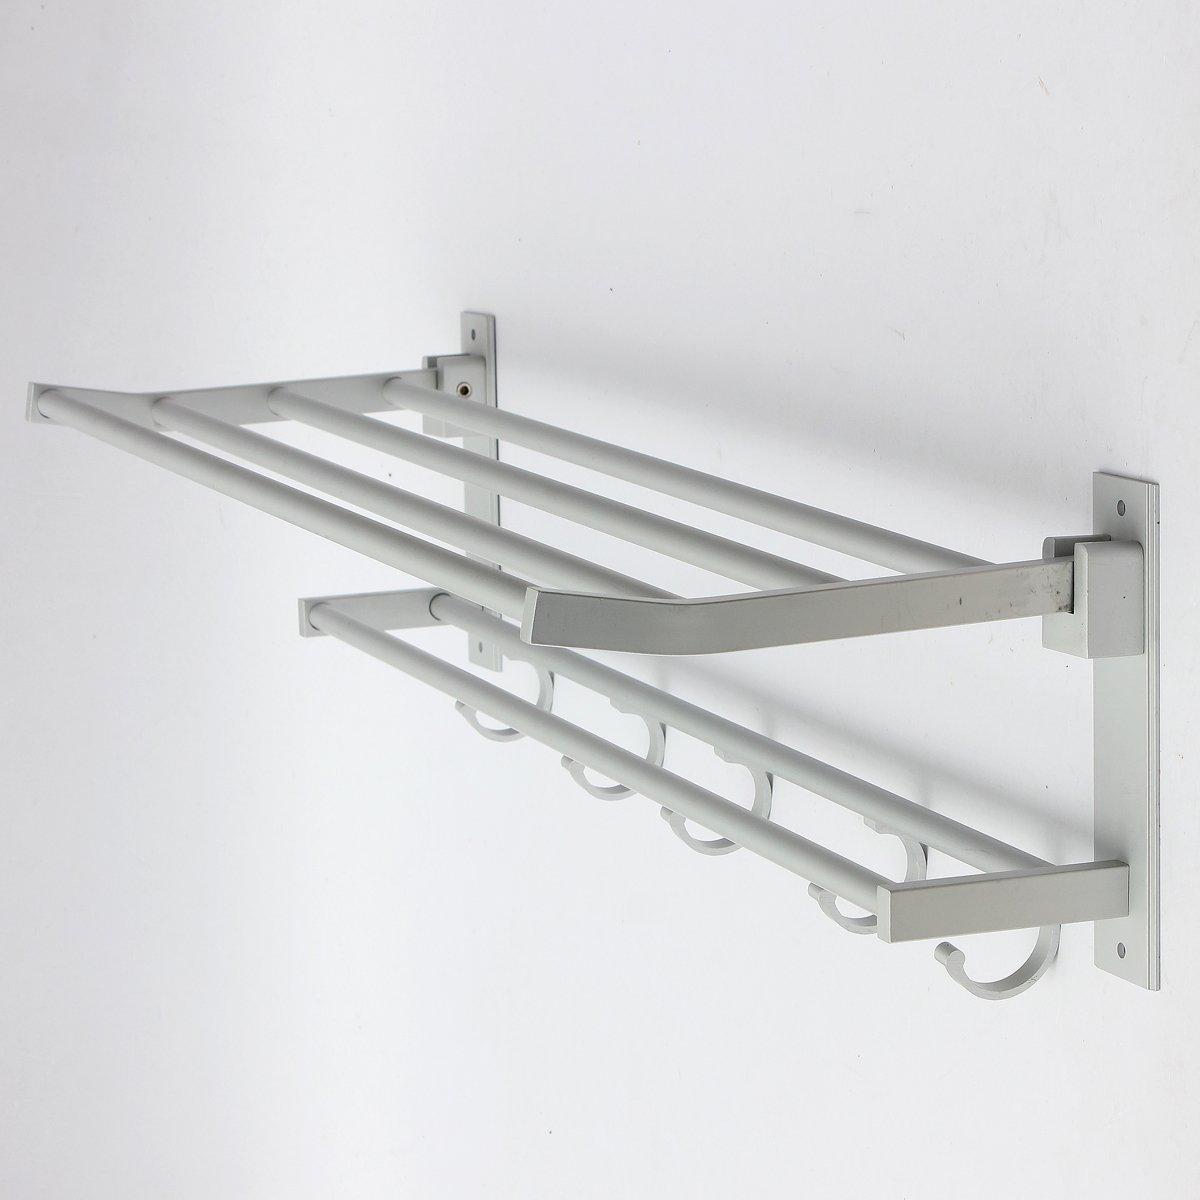 Amazon.com: Towel Hooks Double Rows Silver Wall Mounted Bathroom ...